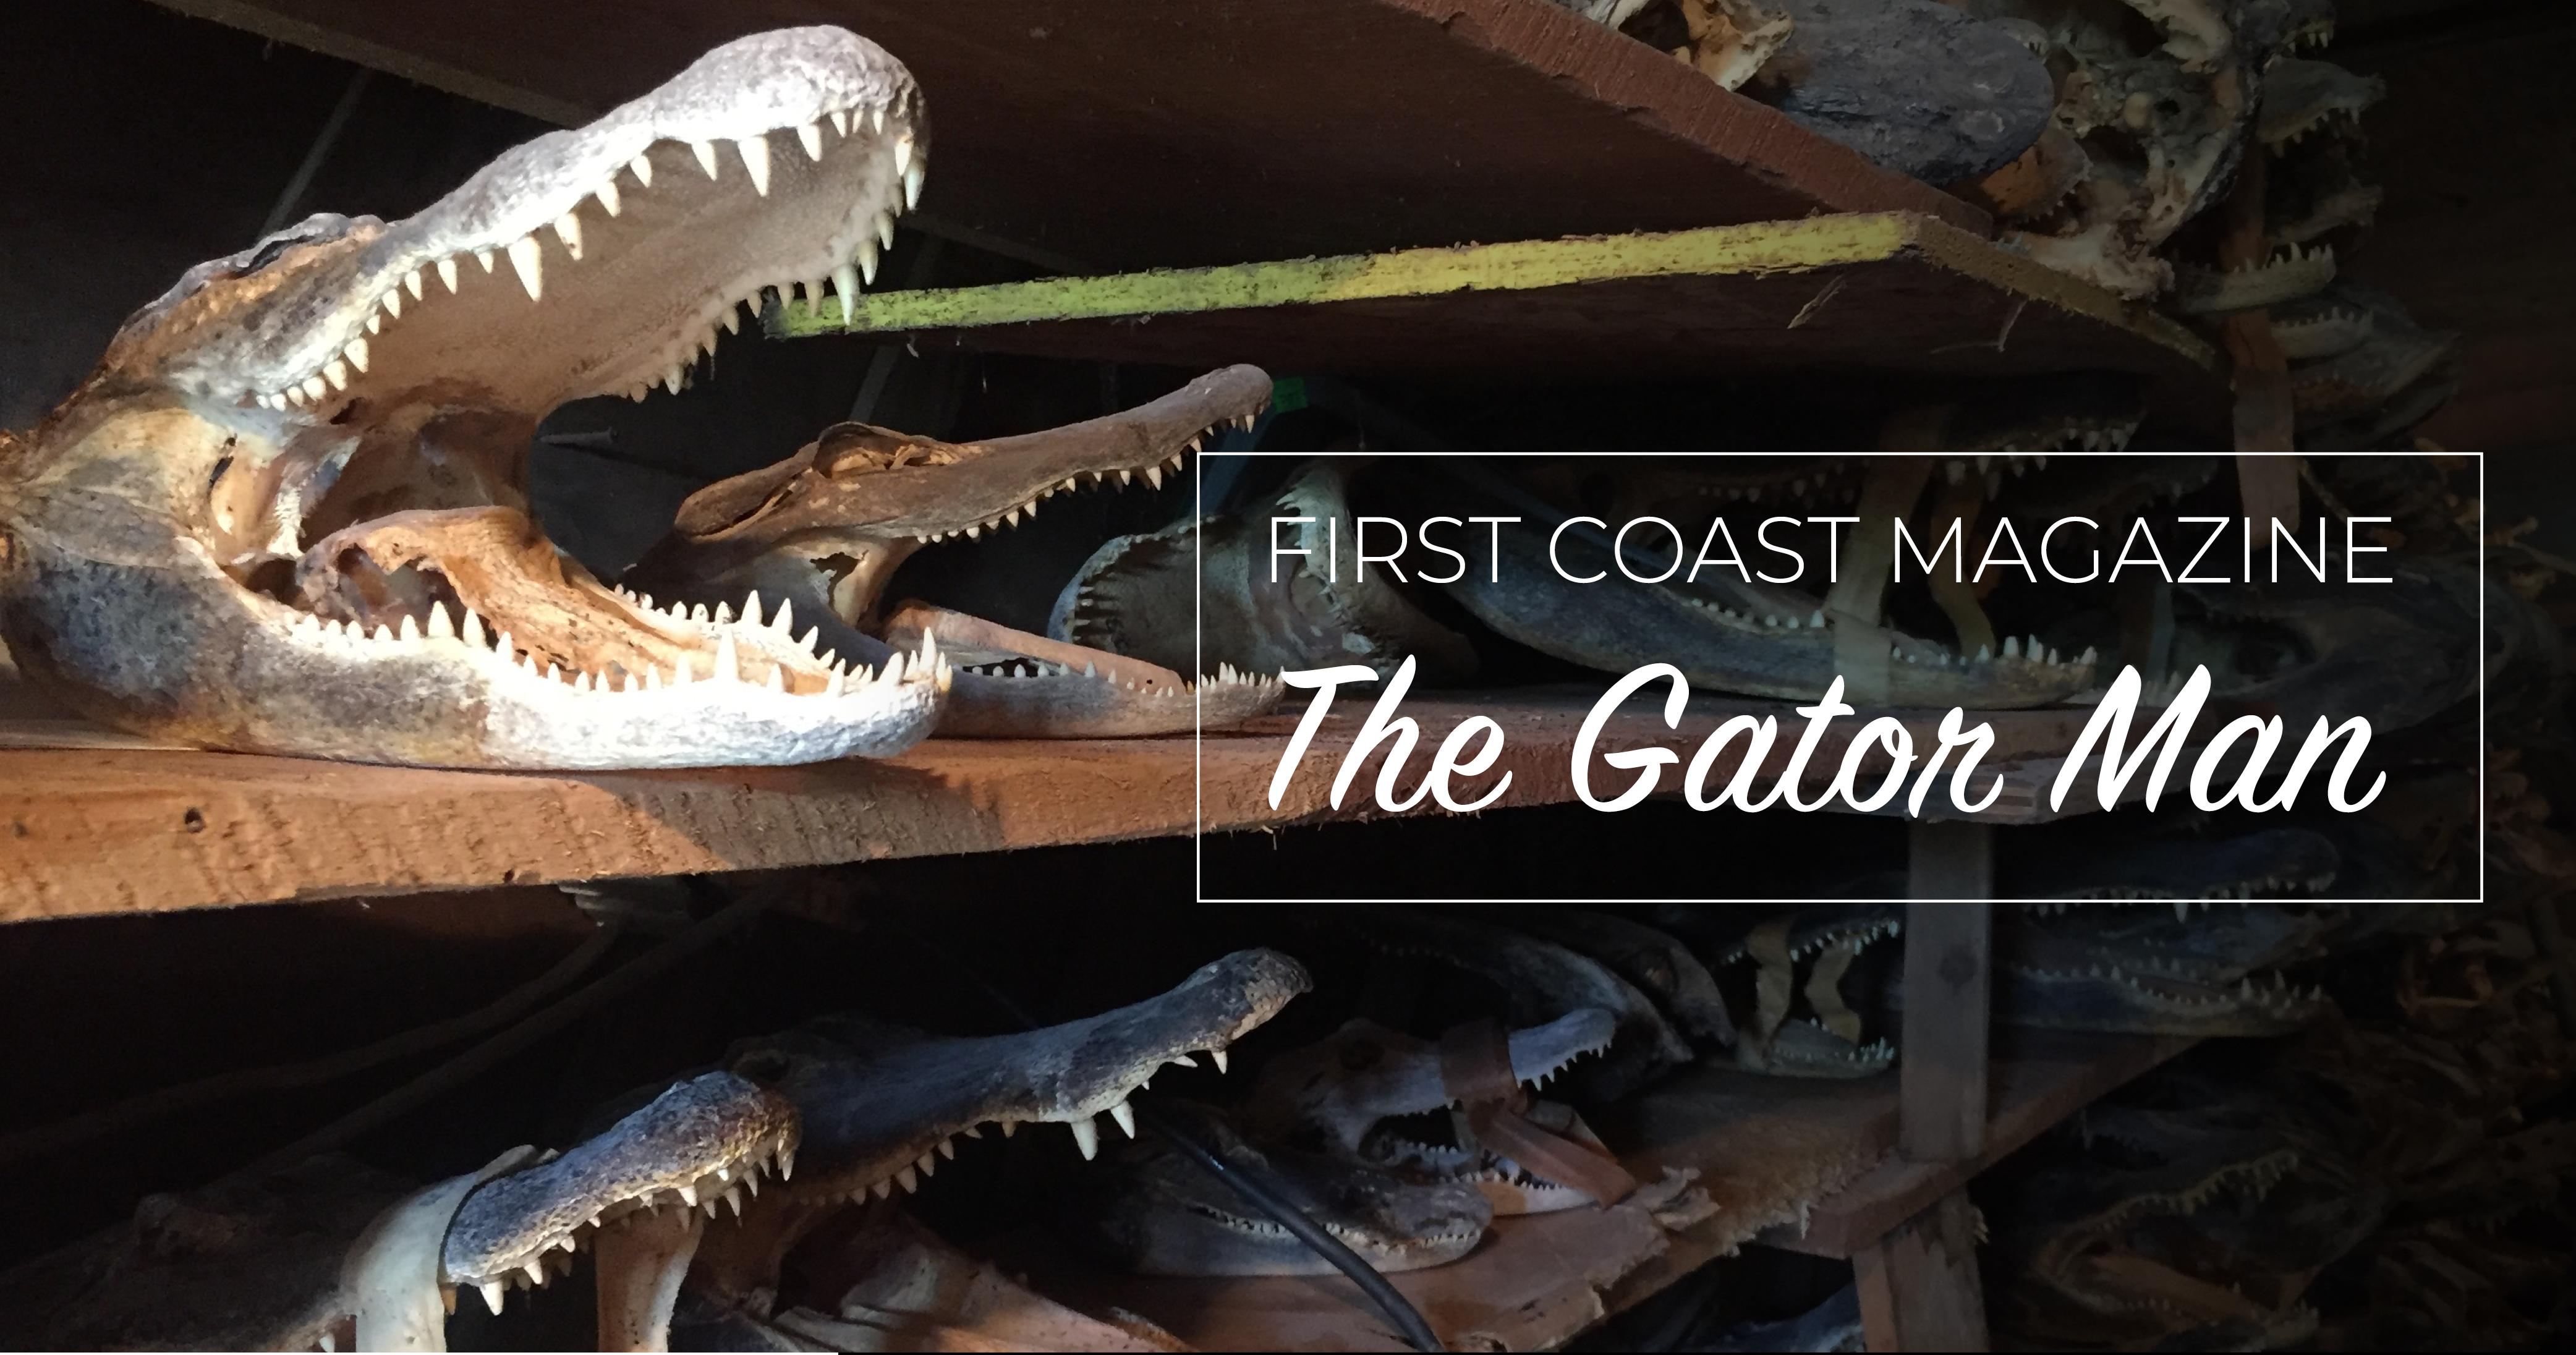 The Gator Man: A True St. Augustine Legend